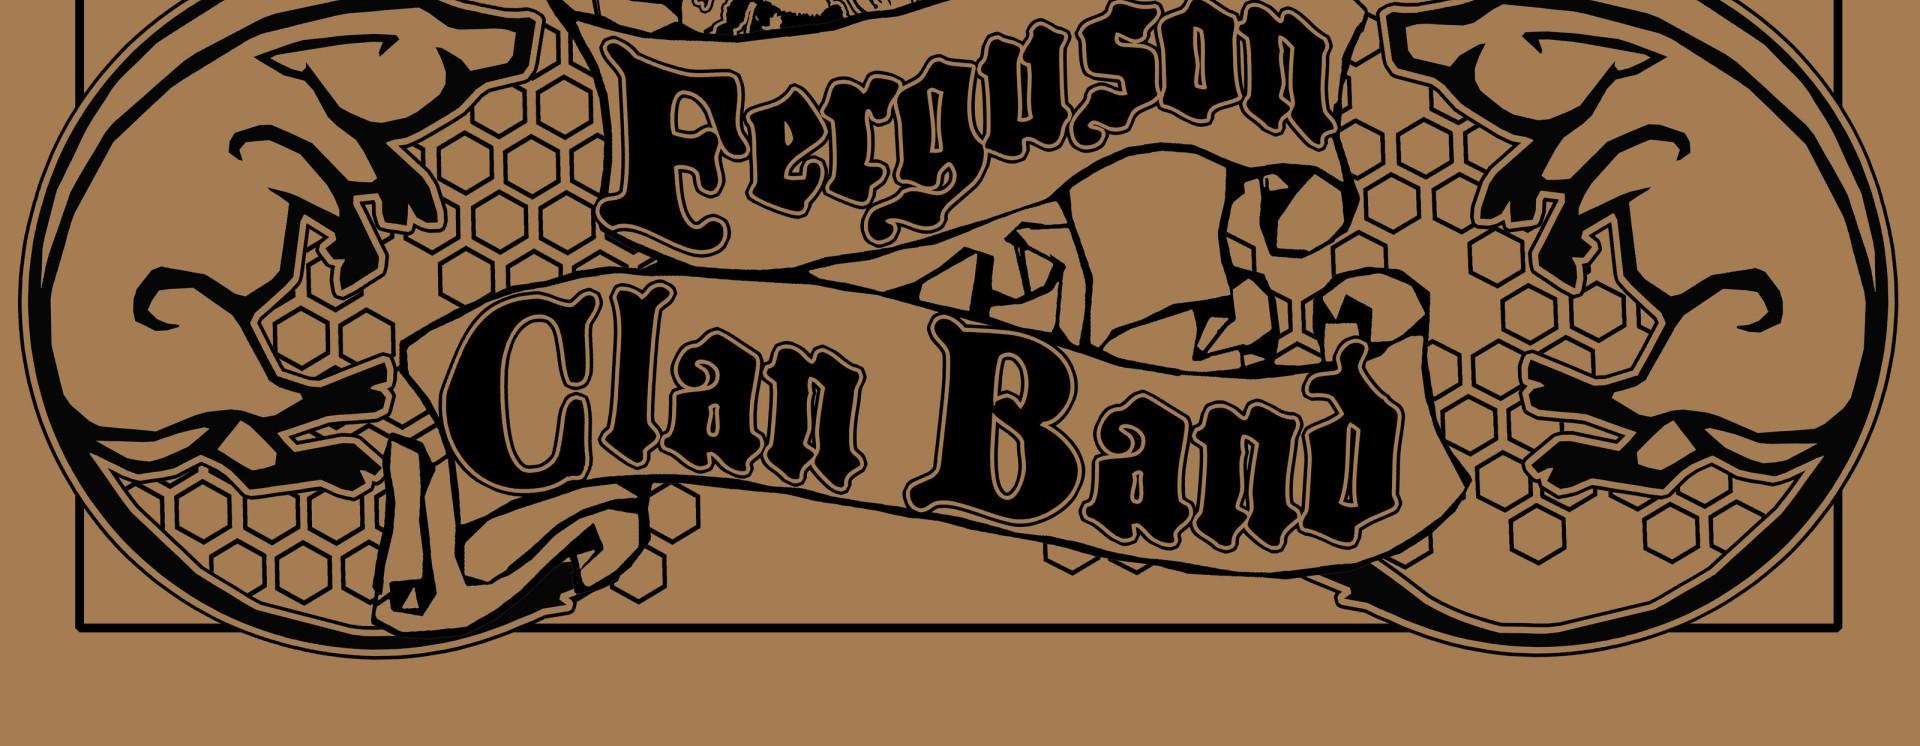 Ferguson Clan Band   ReverbNation